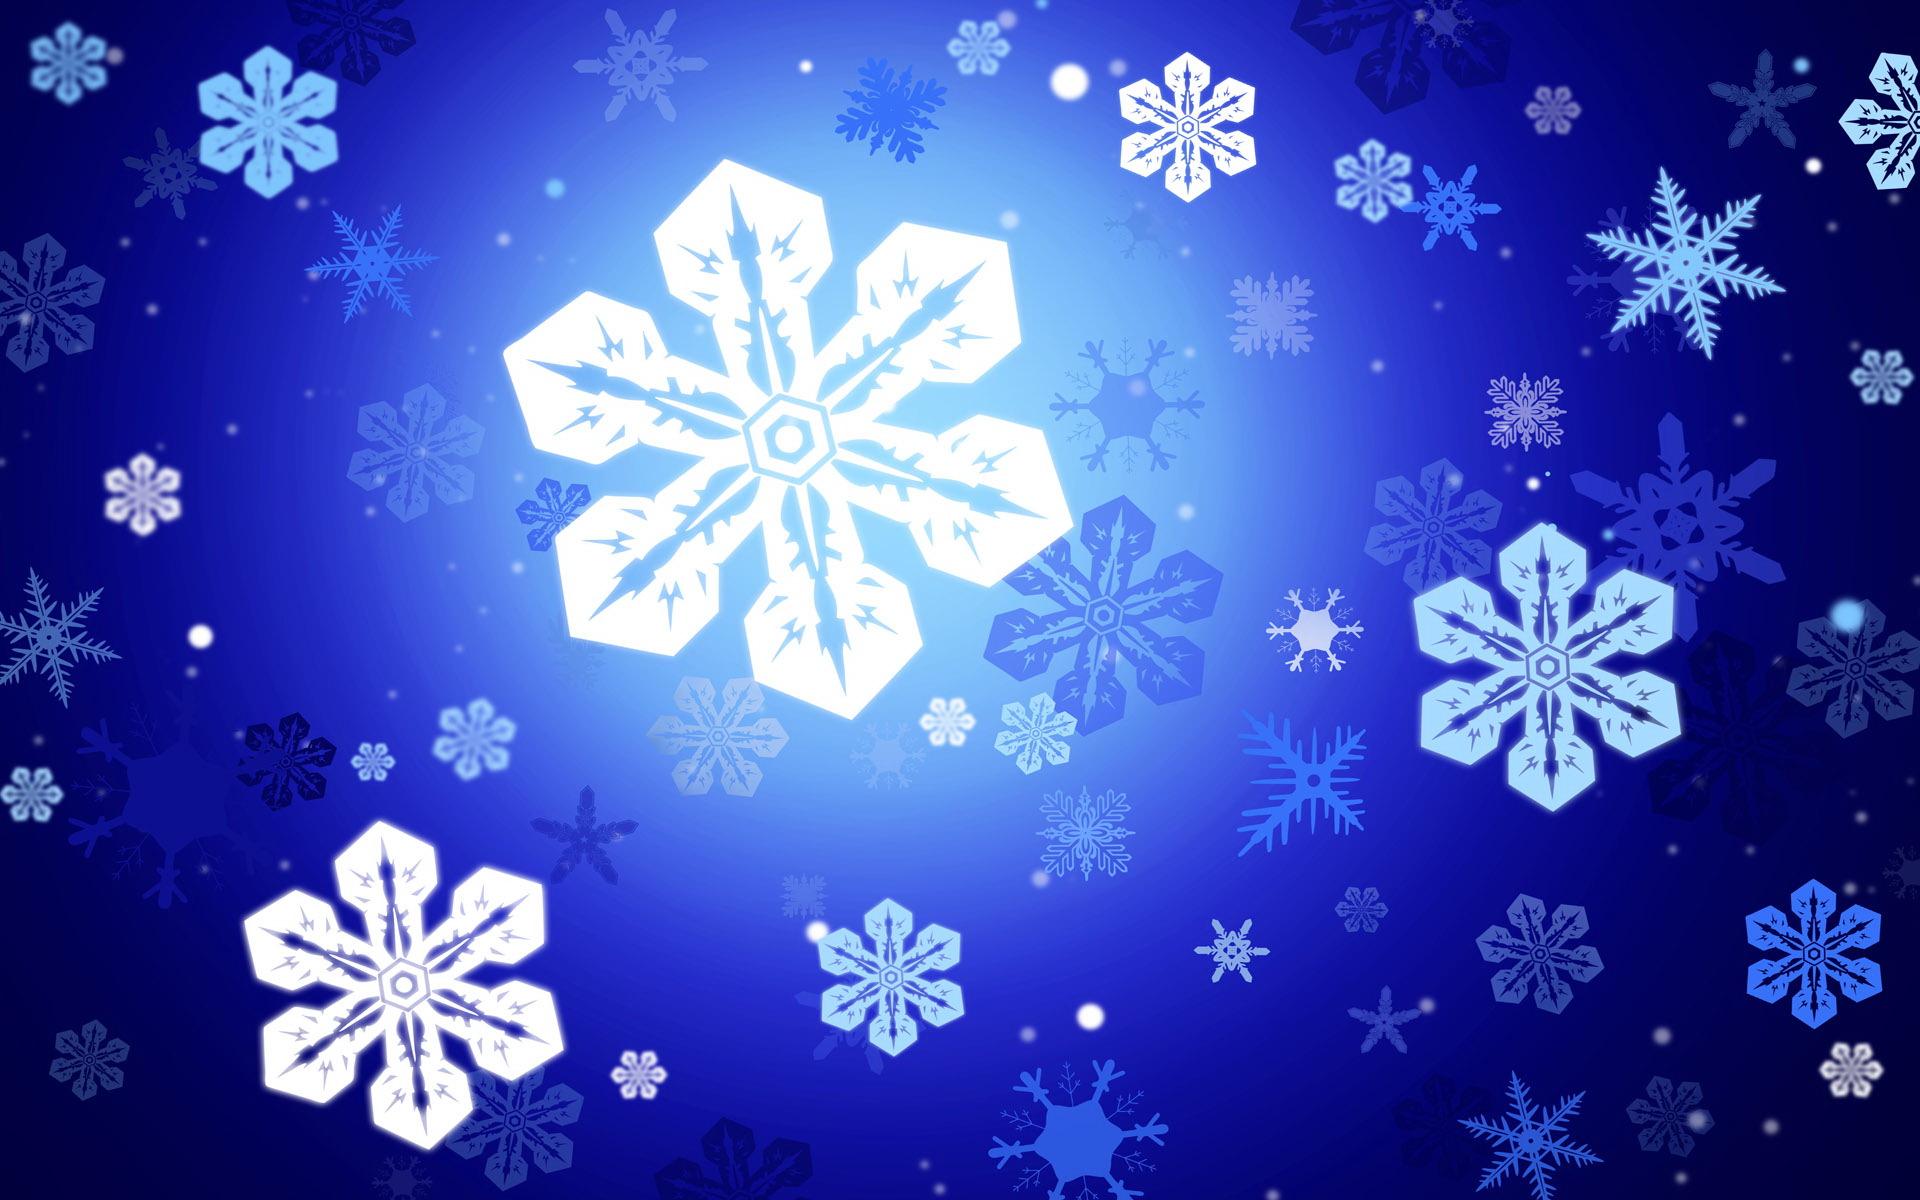 Snowflakes Wallpapers Desktop Wallpapers 1920x1200